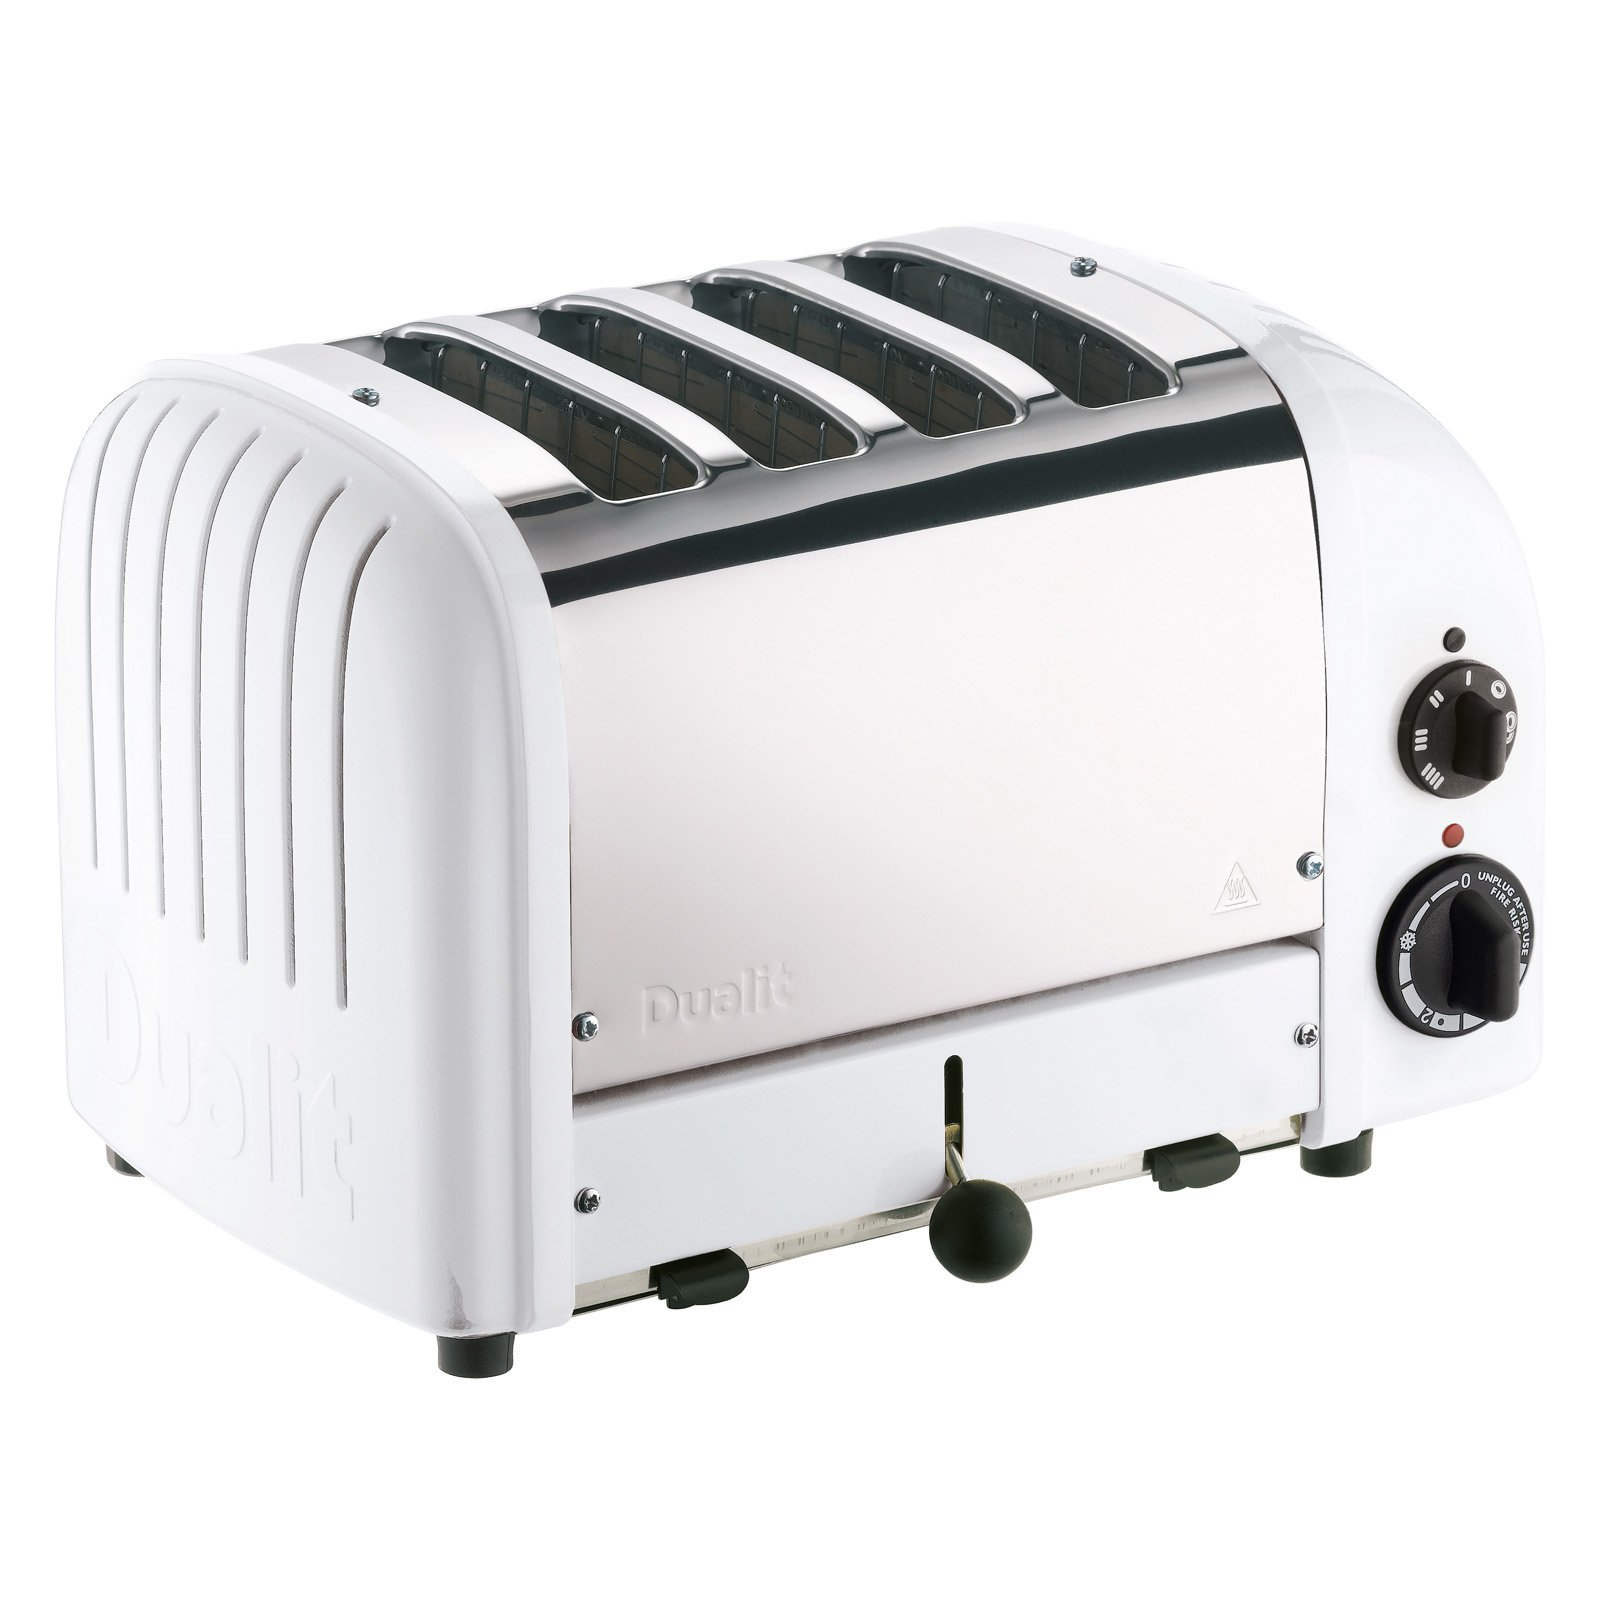 Dualit 47153 4 Slice NewGen Toaster - White